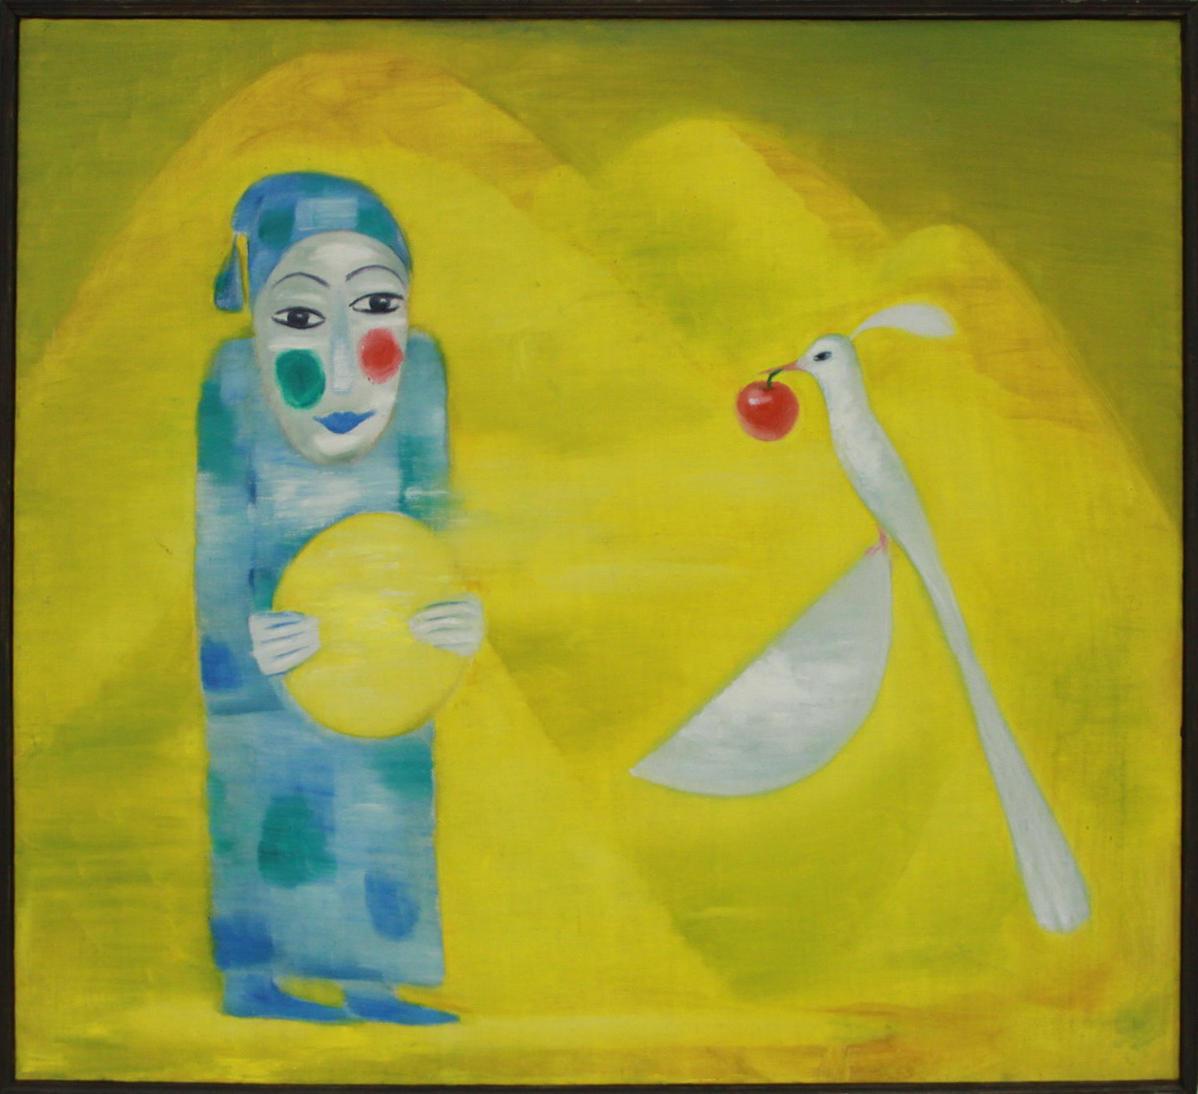 Хакимов Ш. _ Красное яблоко. 1992